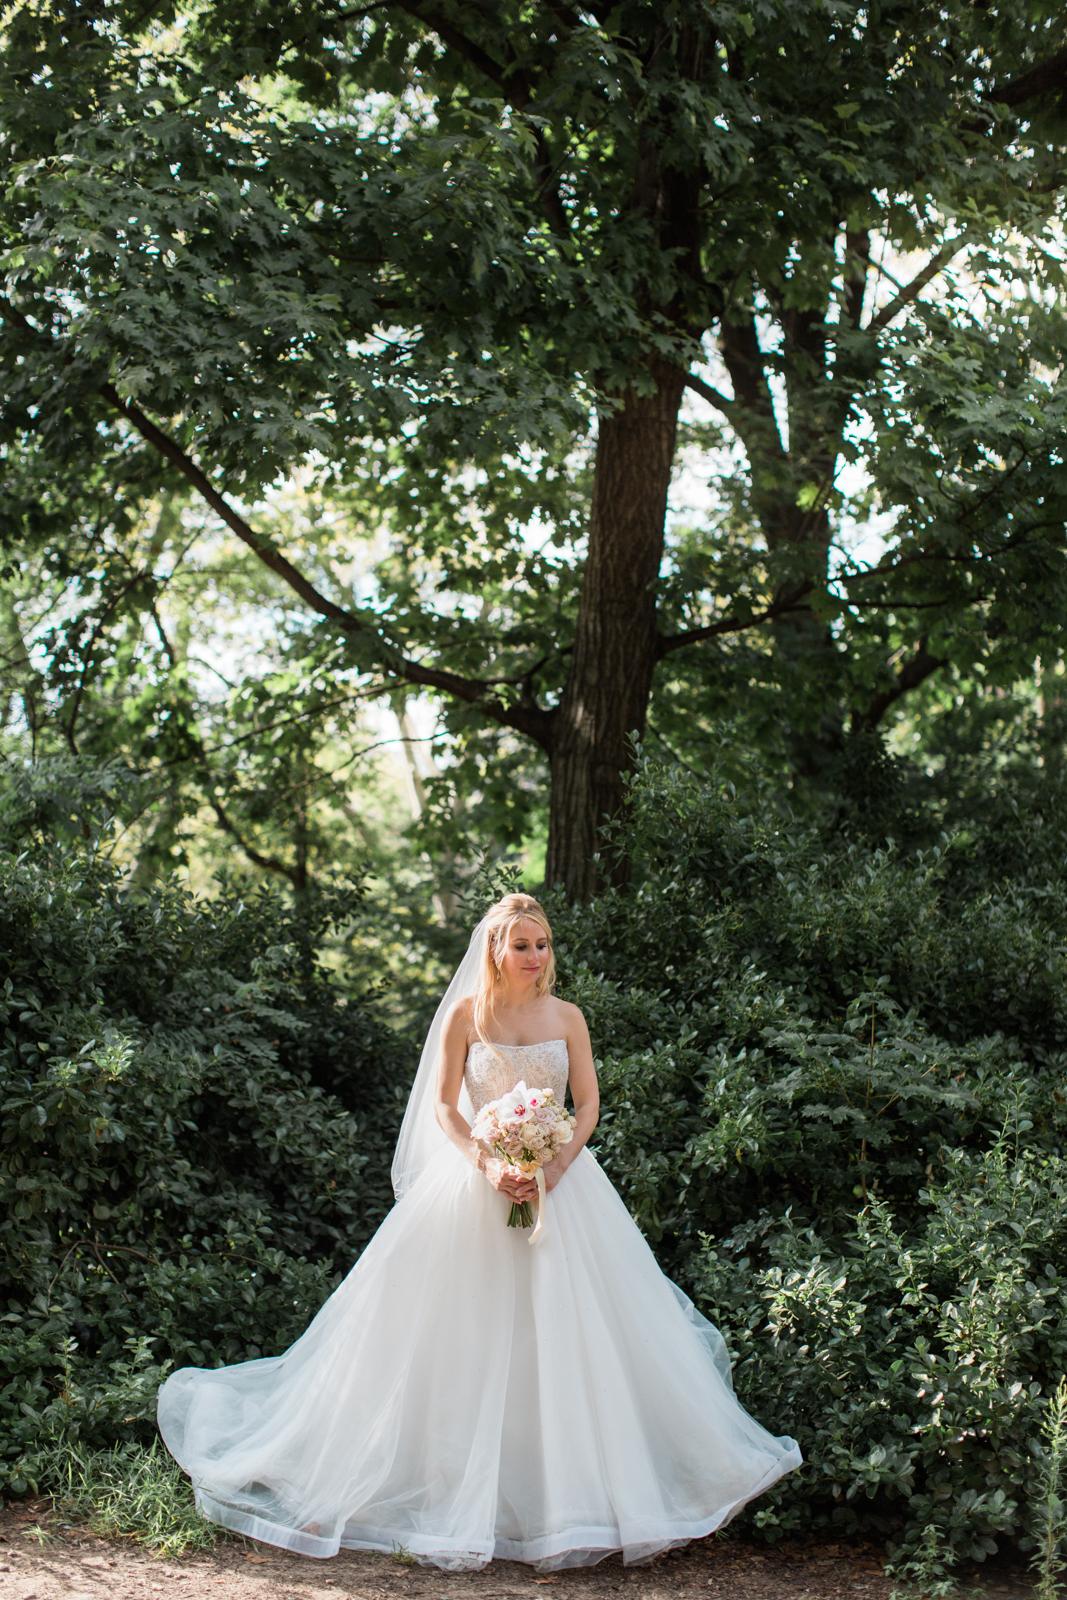 NYC Wedding Photography Sofitel Central Park Brooklyn Photographer Boris Zaretsky _B2C2607.jpg